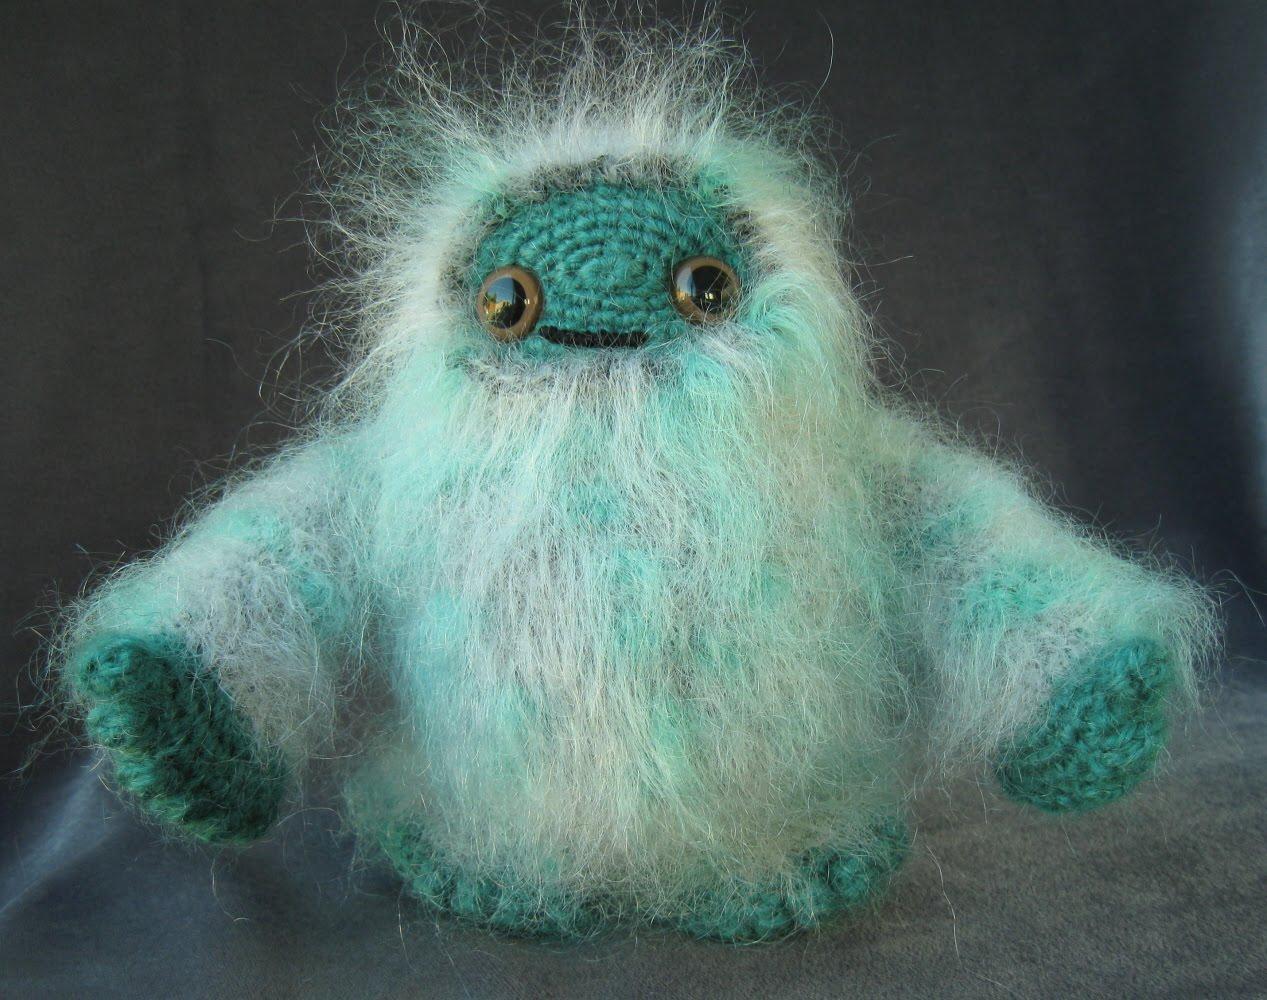 Amigurumi Monster Pattern Free Crochet : Lucyravenscar crochet creatures adorable monsters